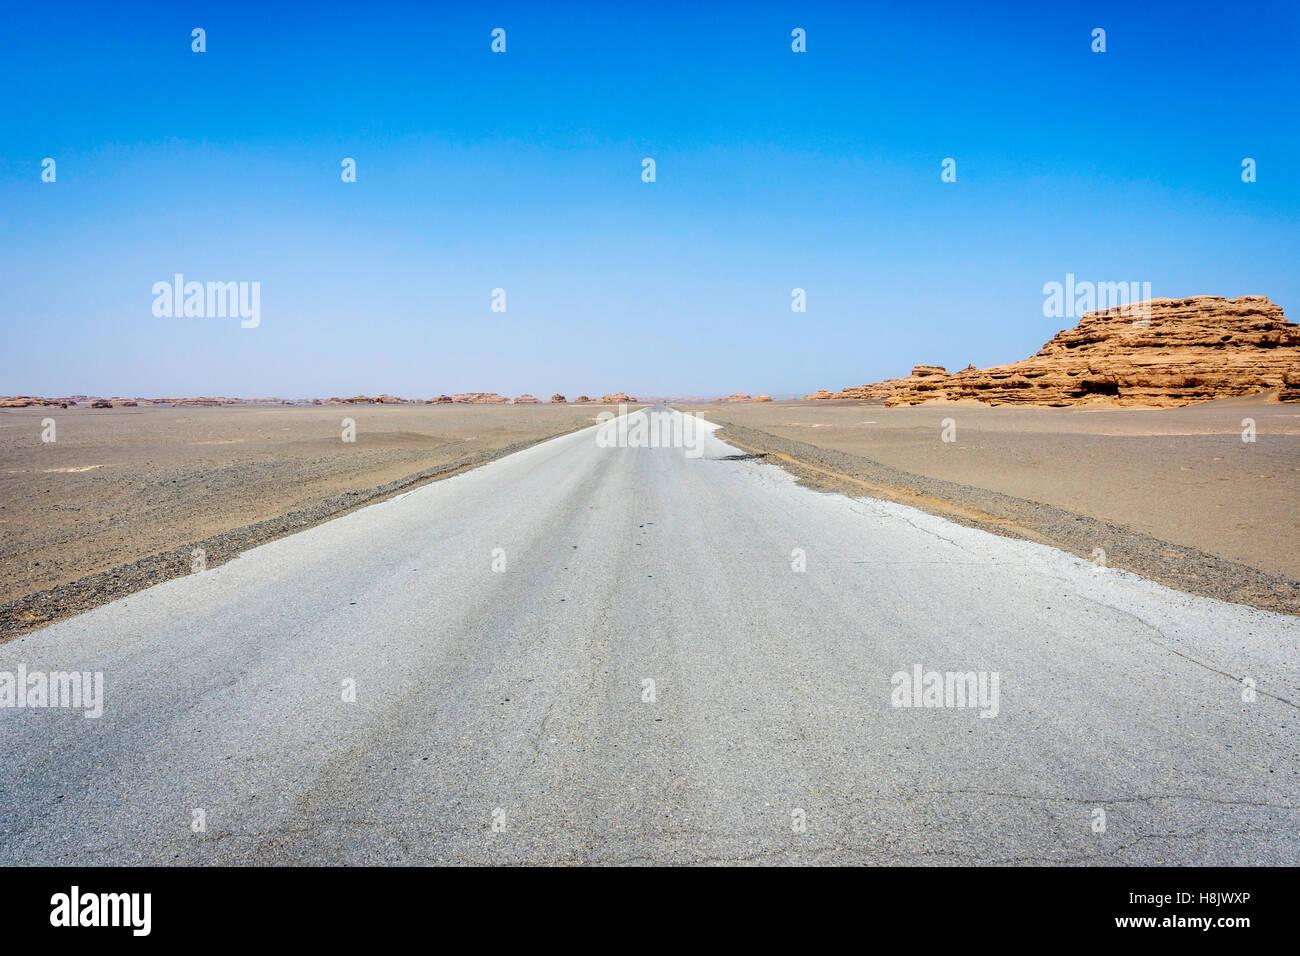 Road straight ahead to Dunhuang Yardang National Geopark, Gobi desert, China - Stock Image